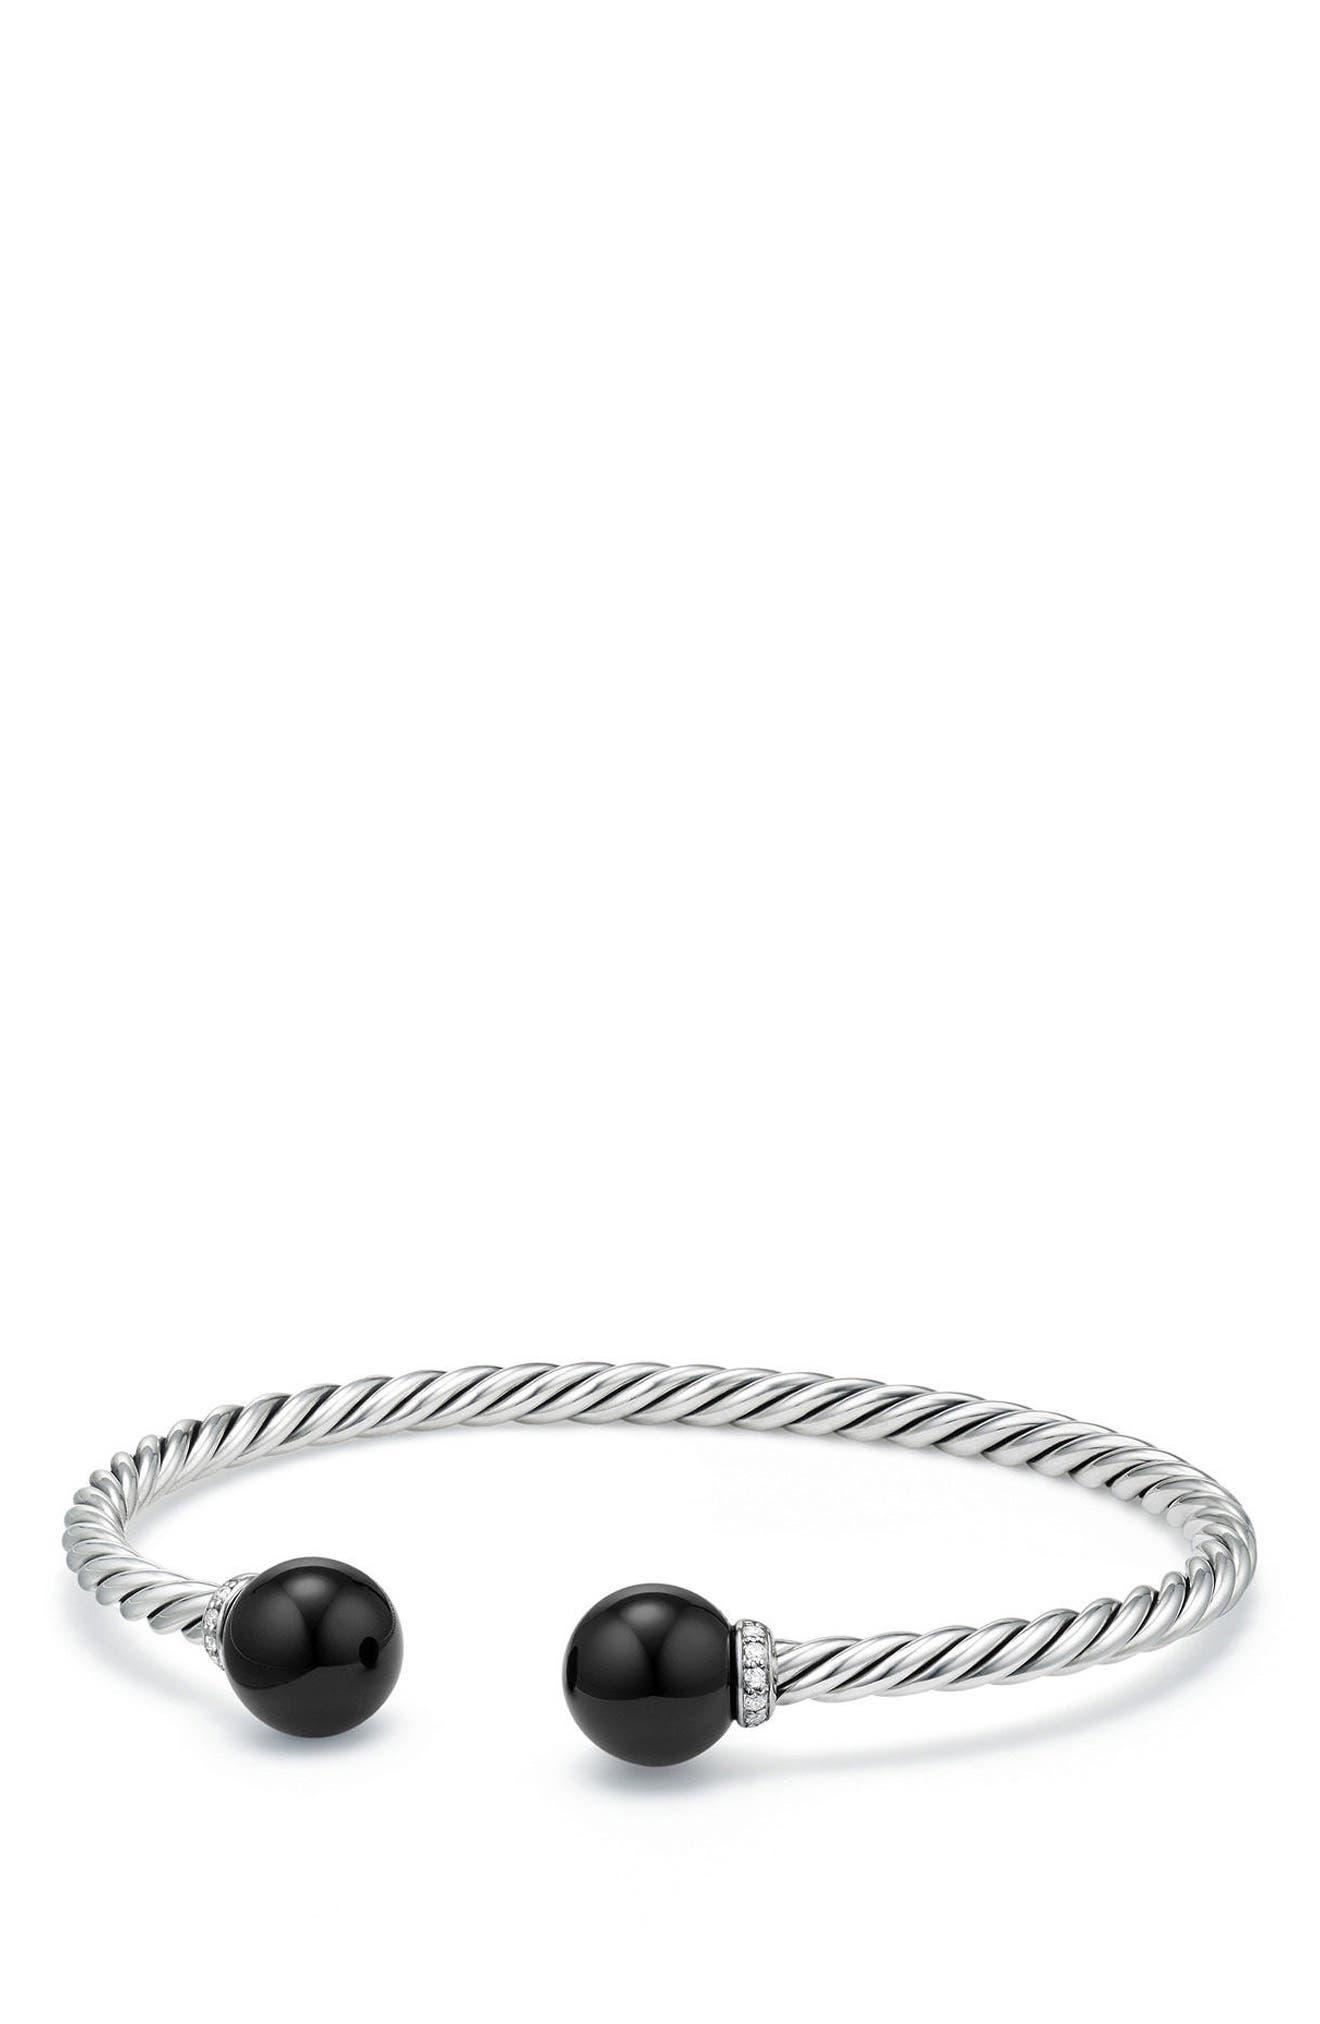 DAVID YURMAN Solari Bead Bracelet with Diamonds, Main, color, SILVER/ DIAMOND/ BLACK ONYX